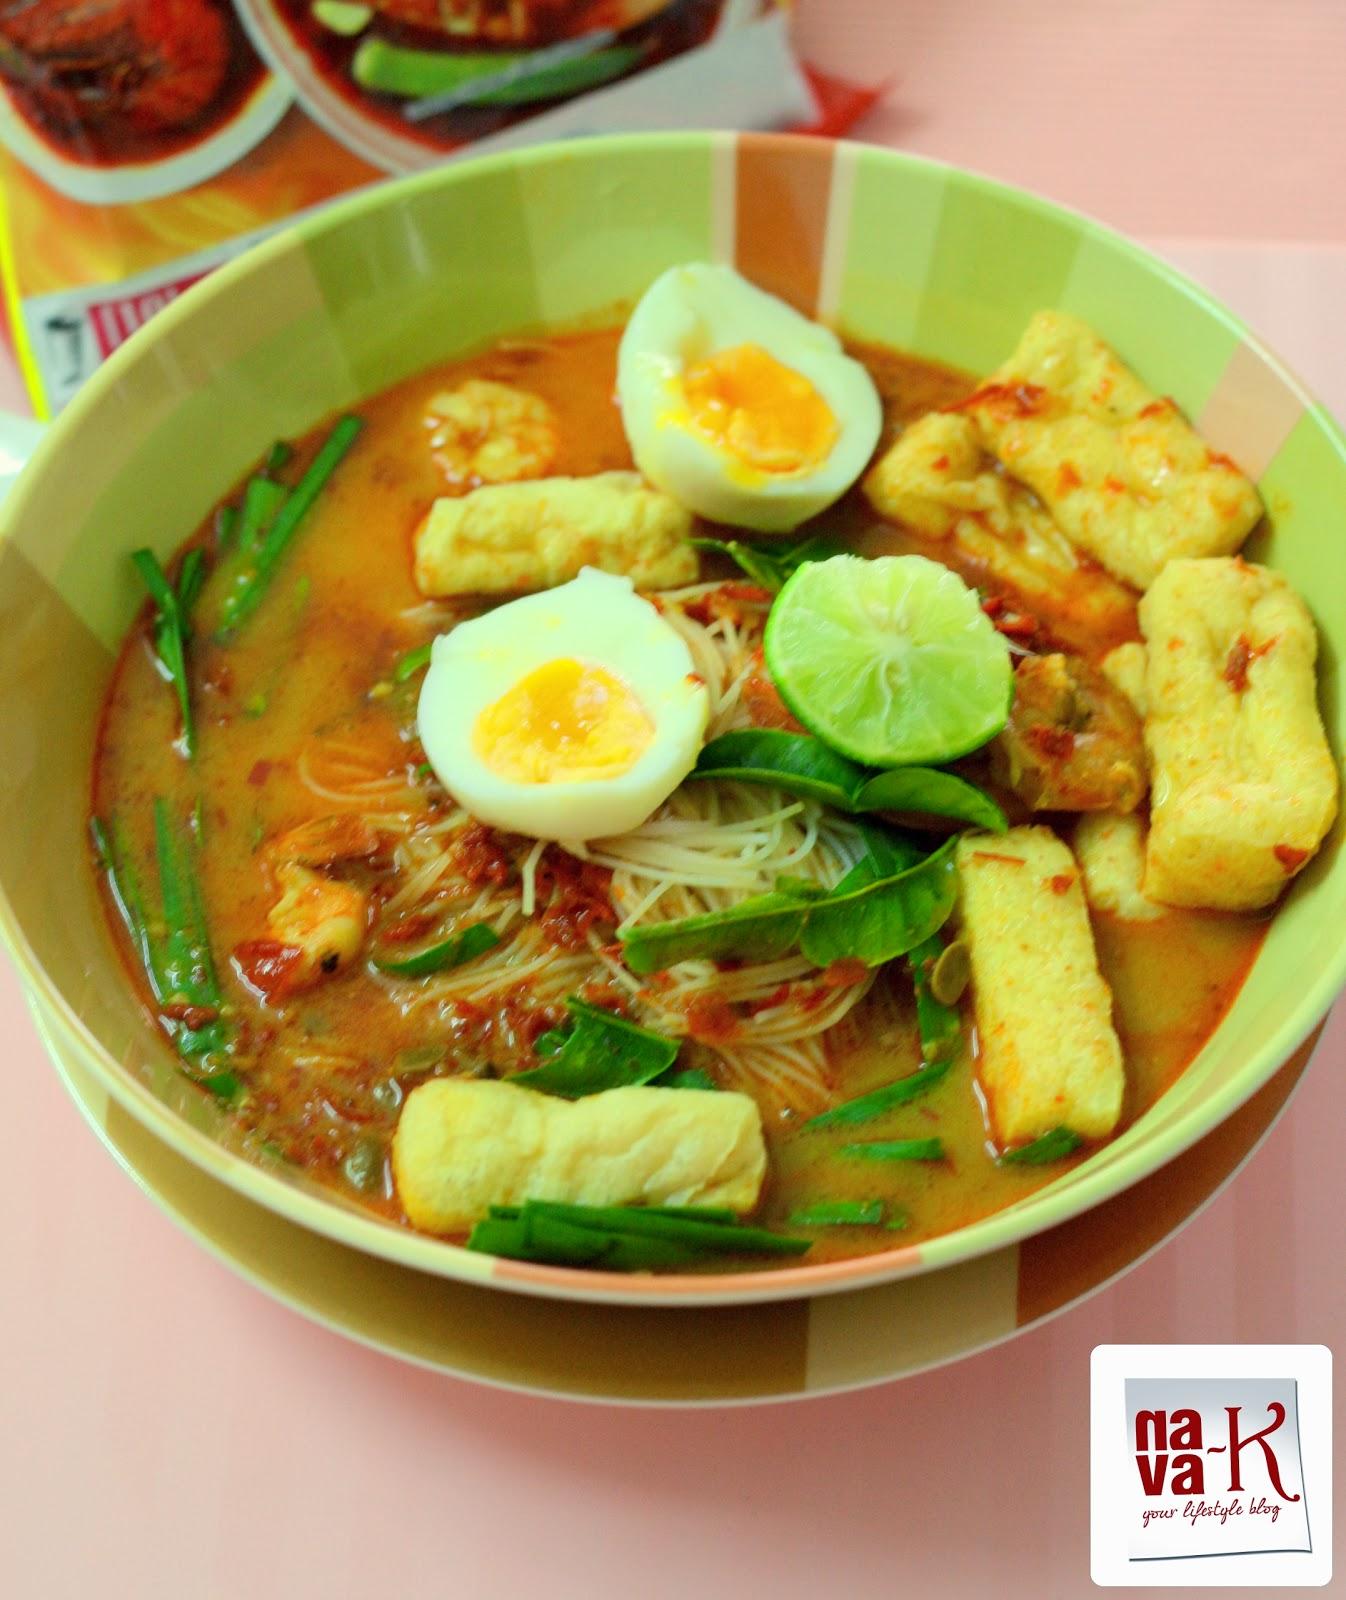 nava-k: Mee Siam (Spicy Rice Vermicelli)